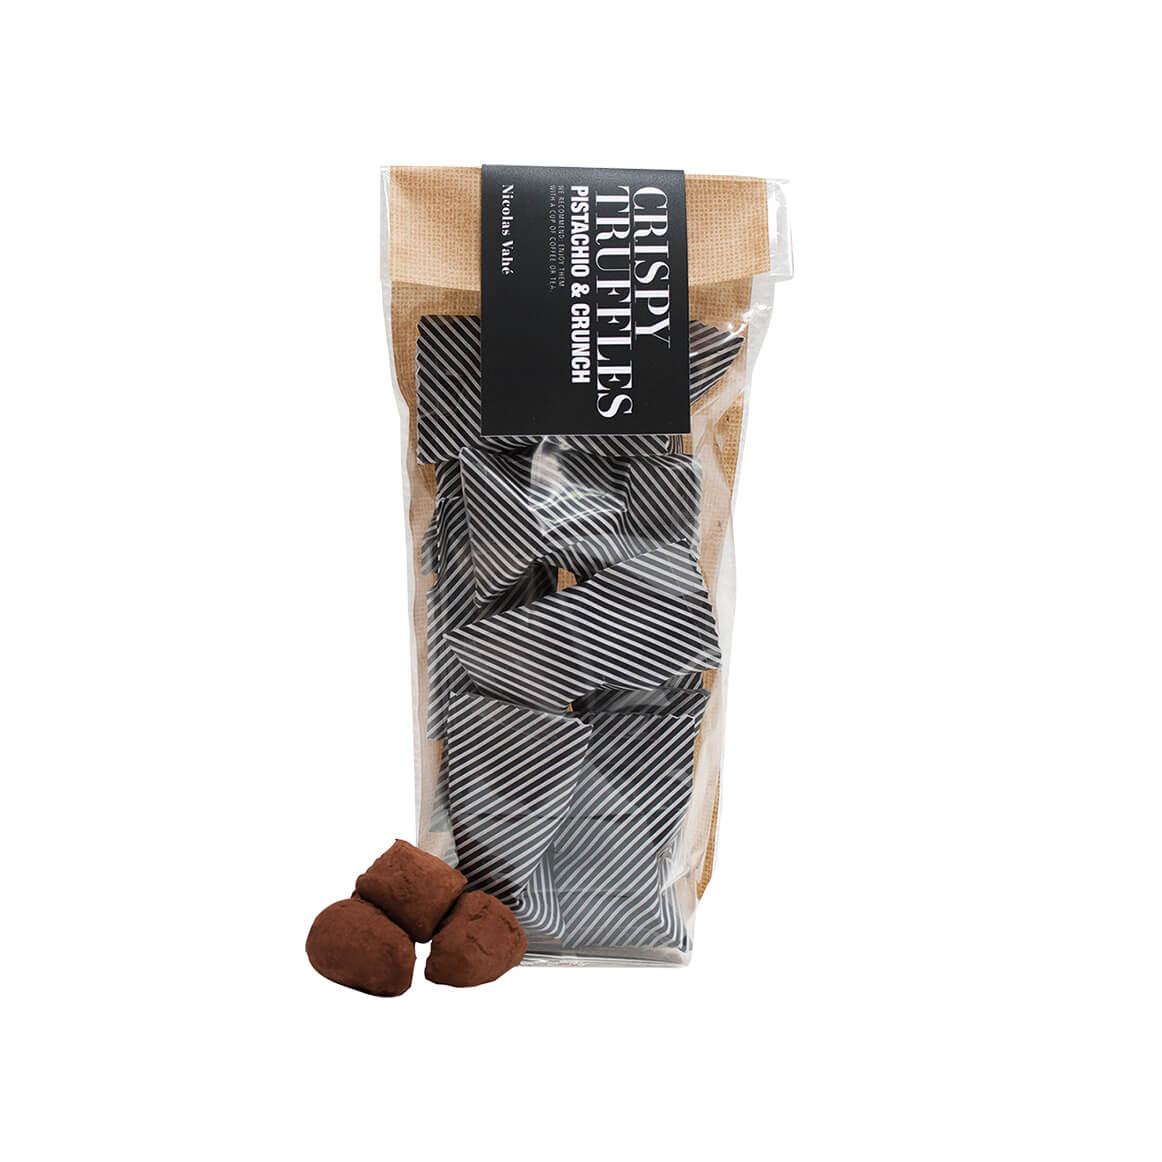 Nicolas Vahé – Schokoladen-Trüffel Pistazie & Crunch